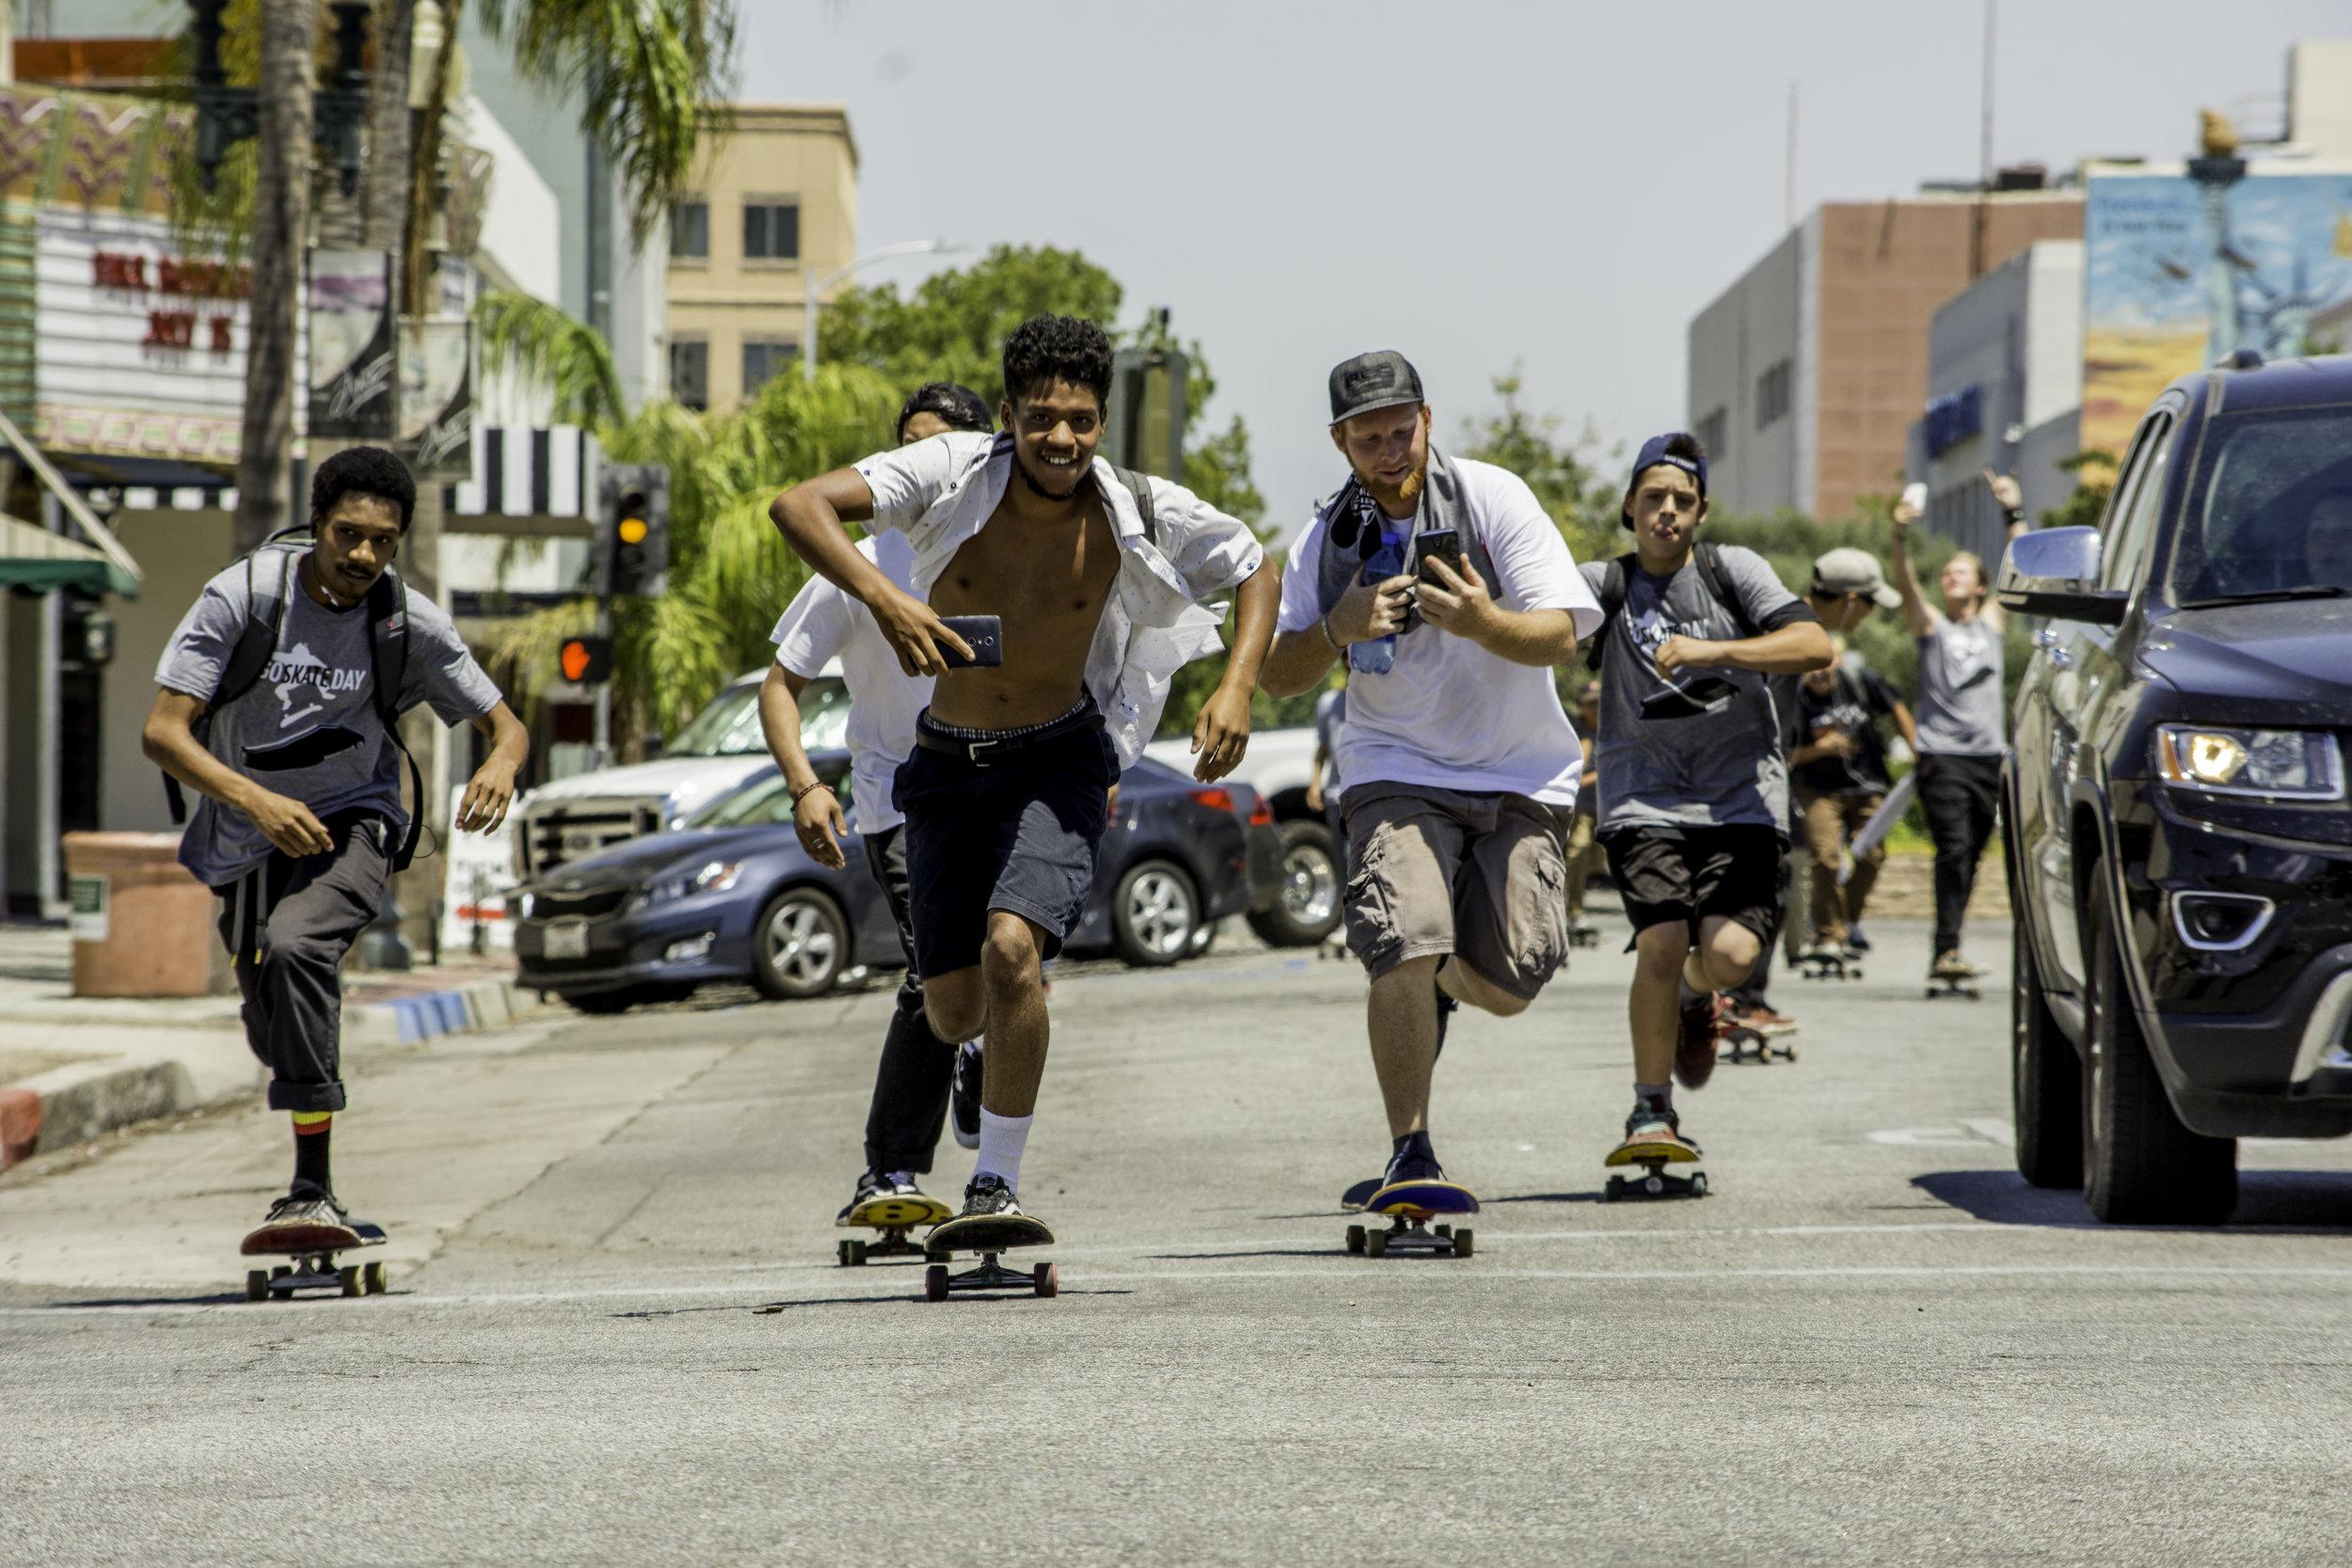 Go Skate Day2 contrast (1 of 1).jpg